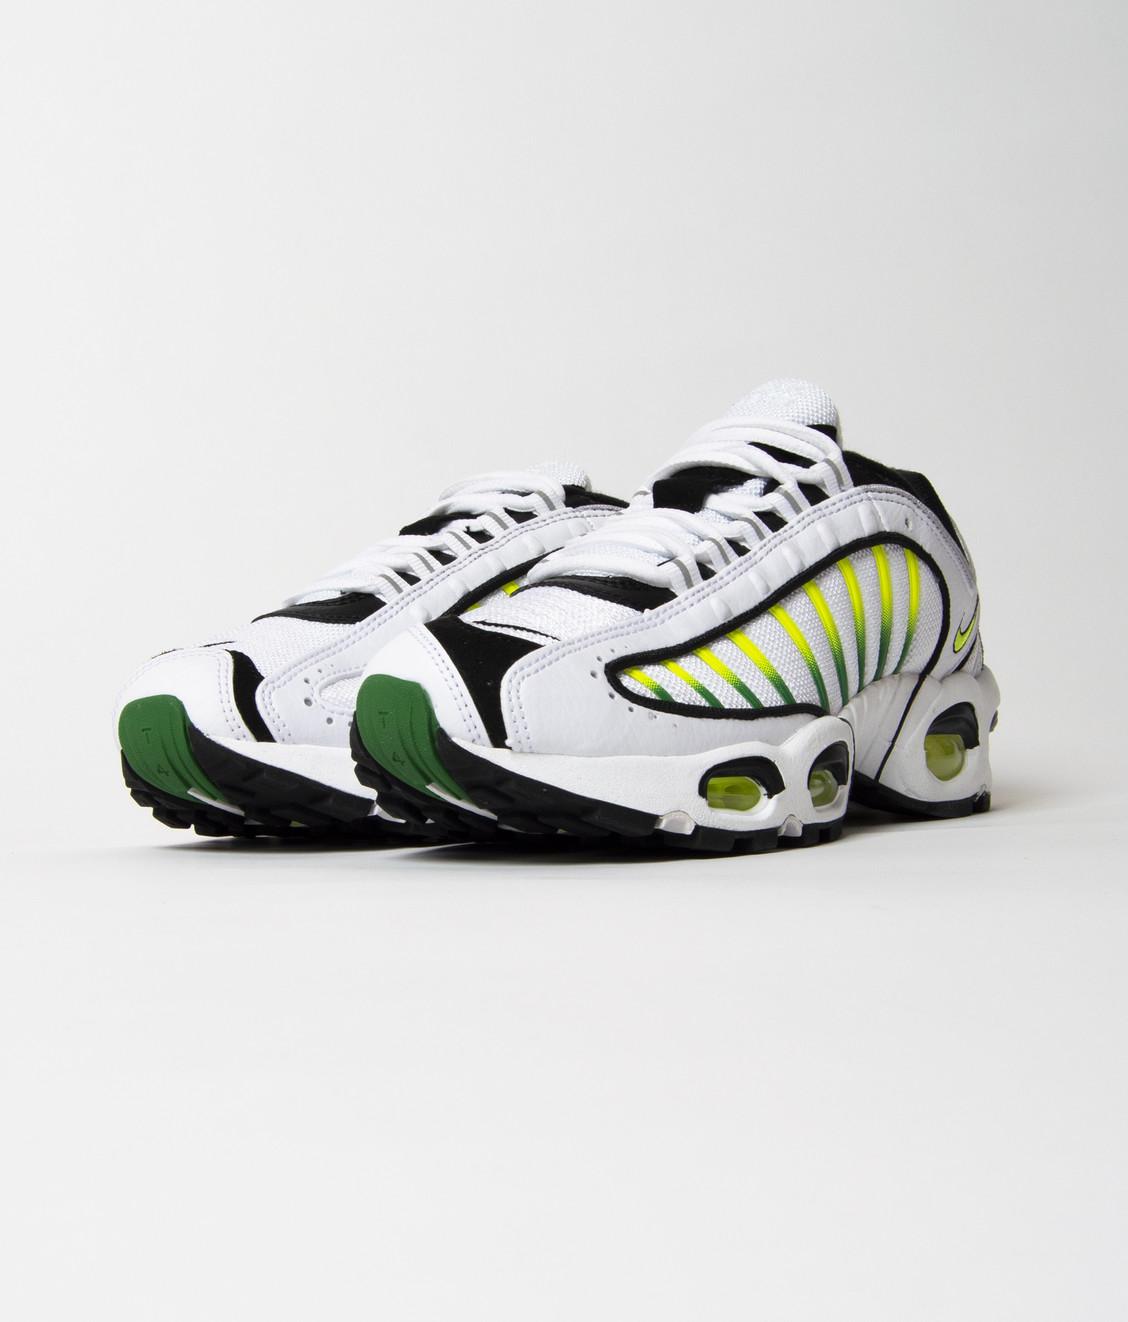 Nike Nike Air Max Tailwind IV White Black Volt